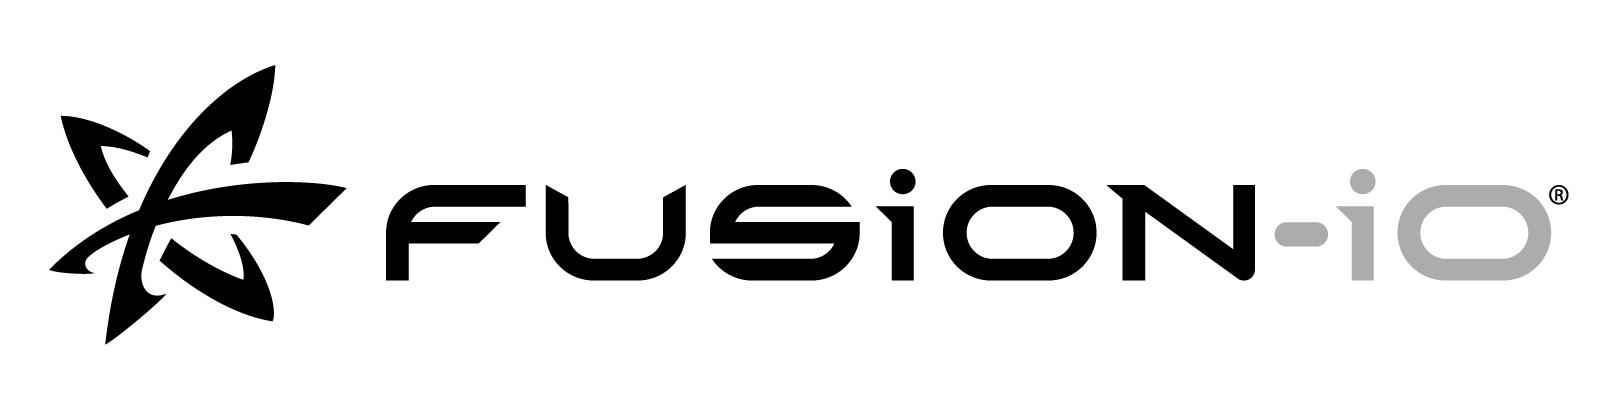 fusionio-logo-wide.jpg